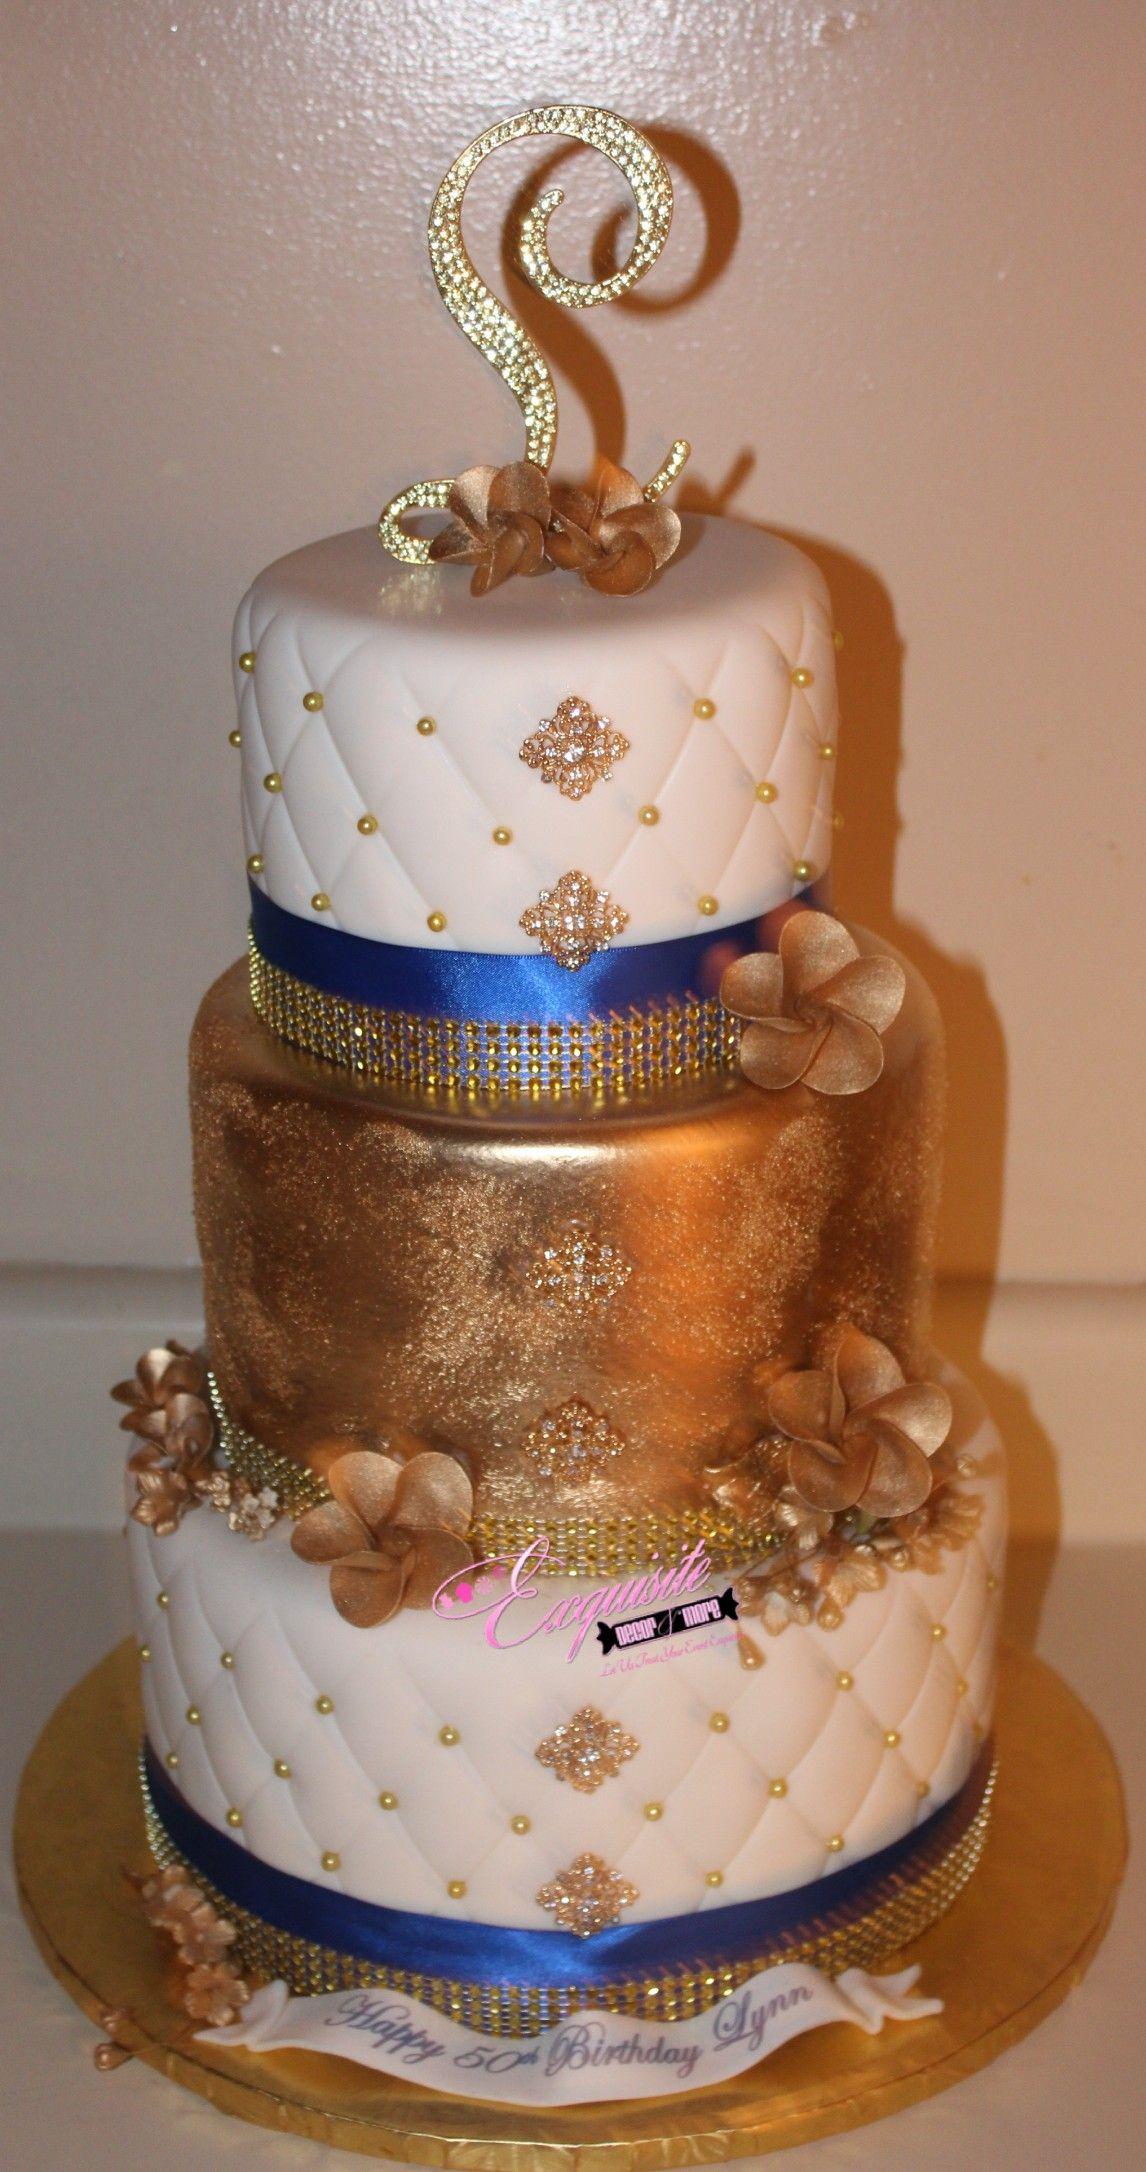 Elegant 50th Birthday Cake Exquisite Dcor More Events Cakes